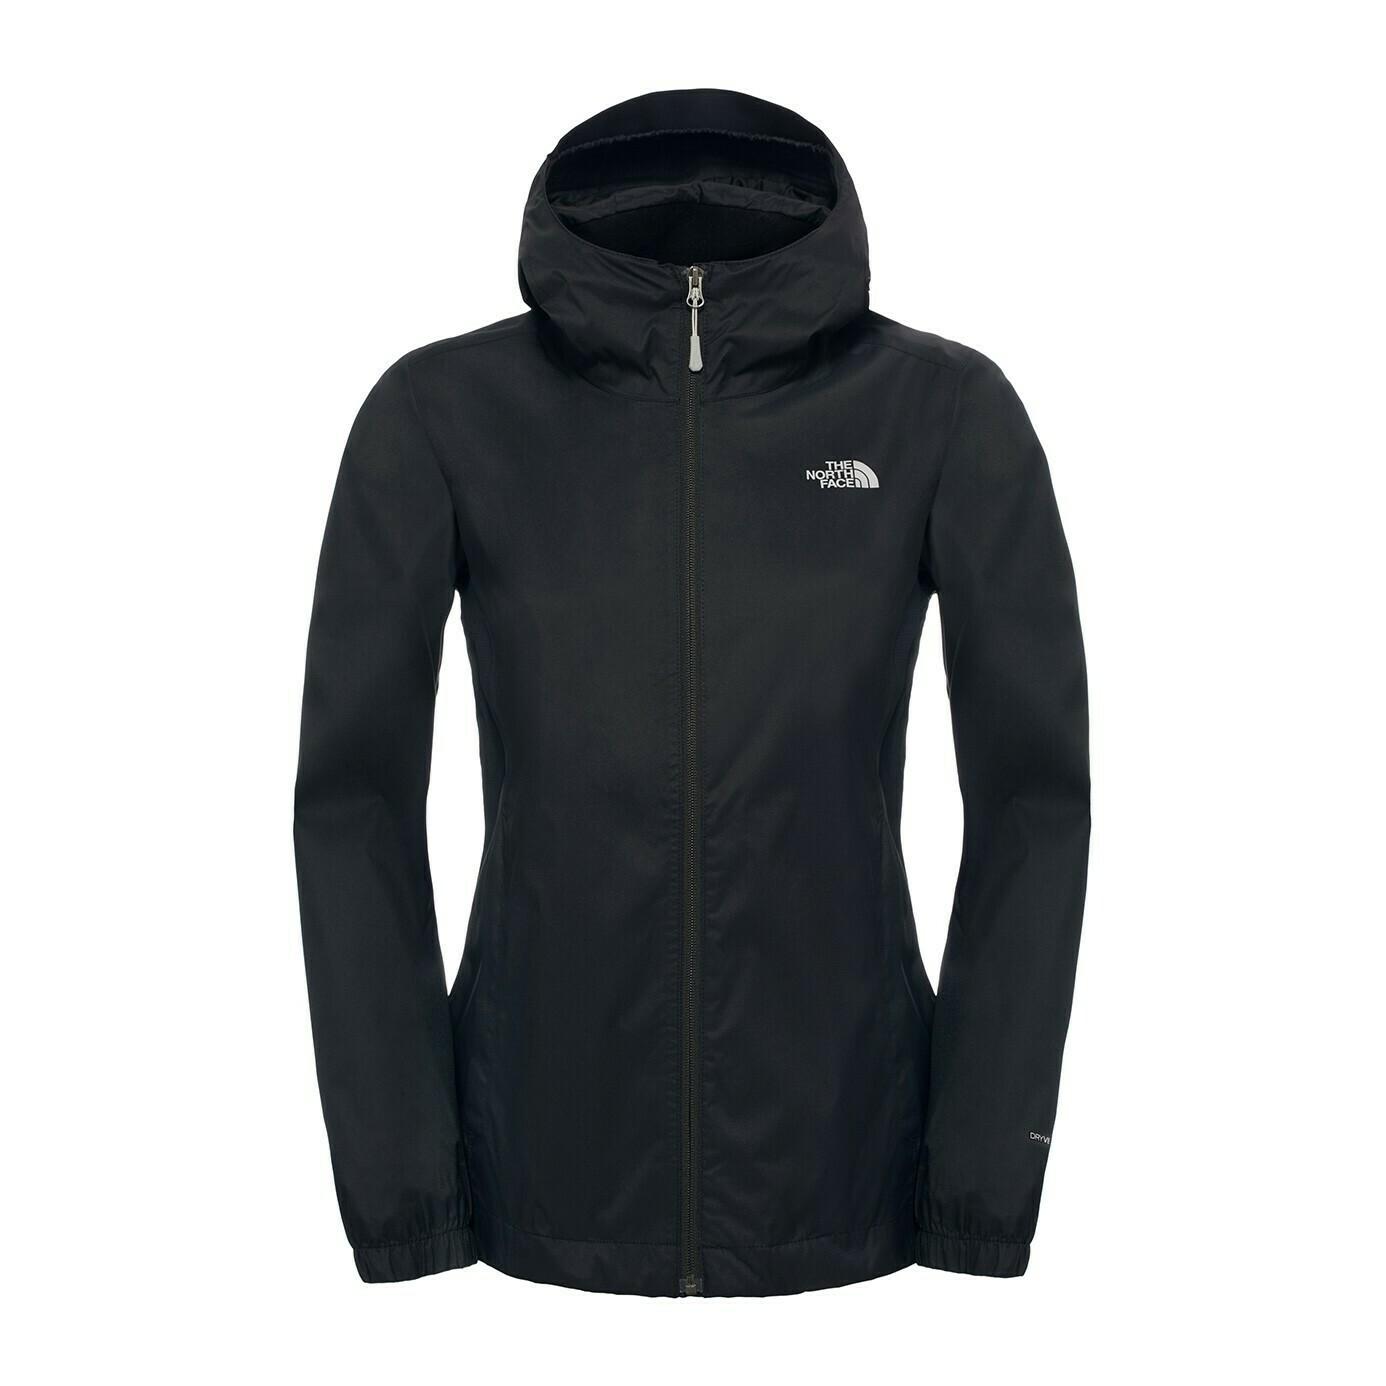 W NF Quest Jacket - Black